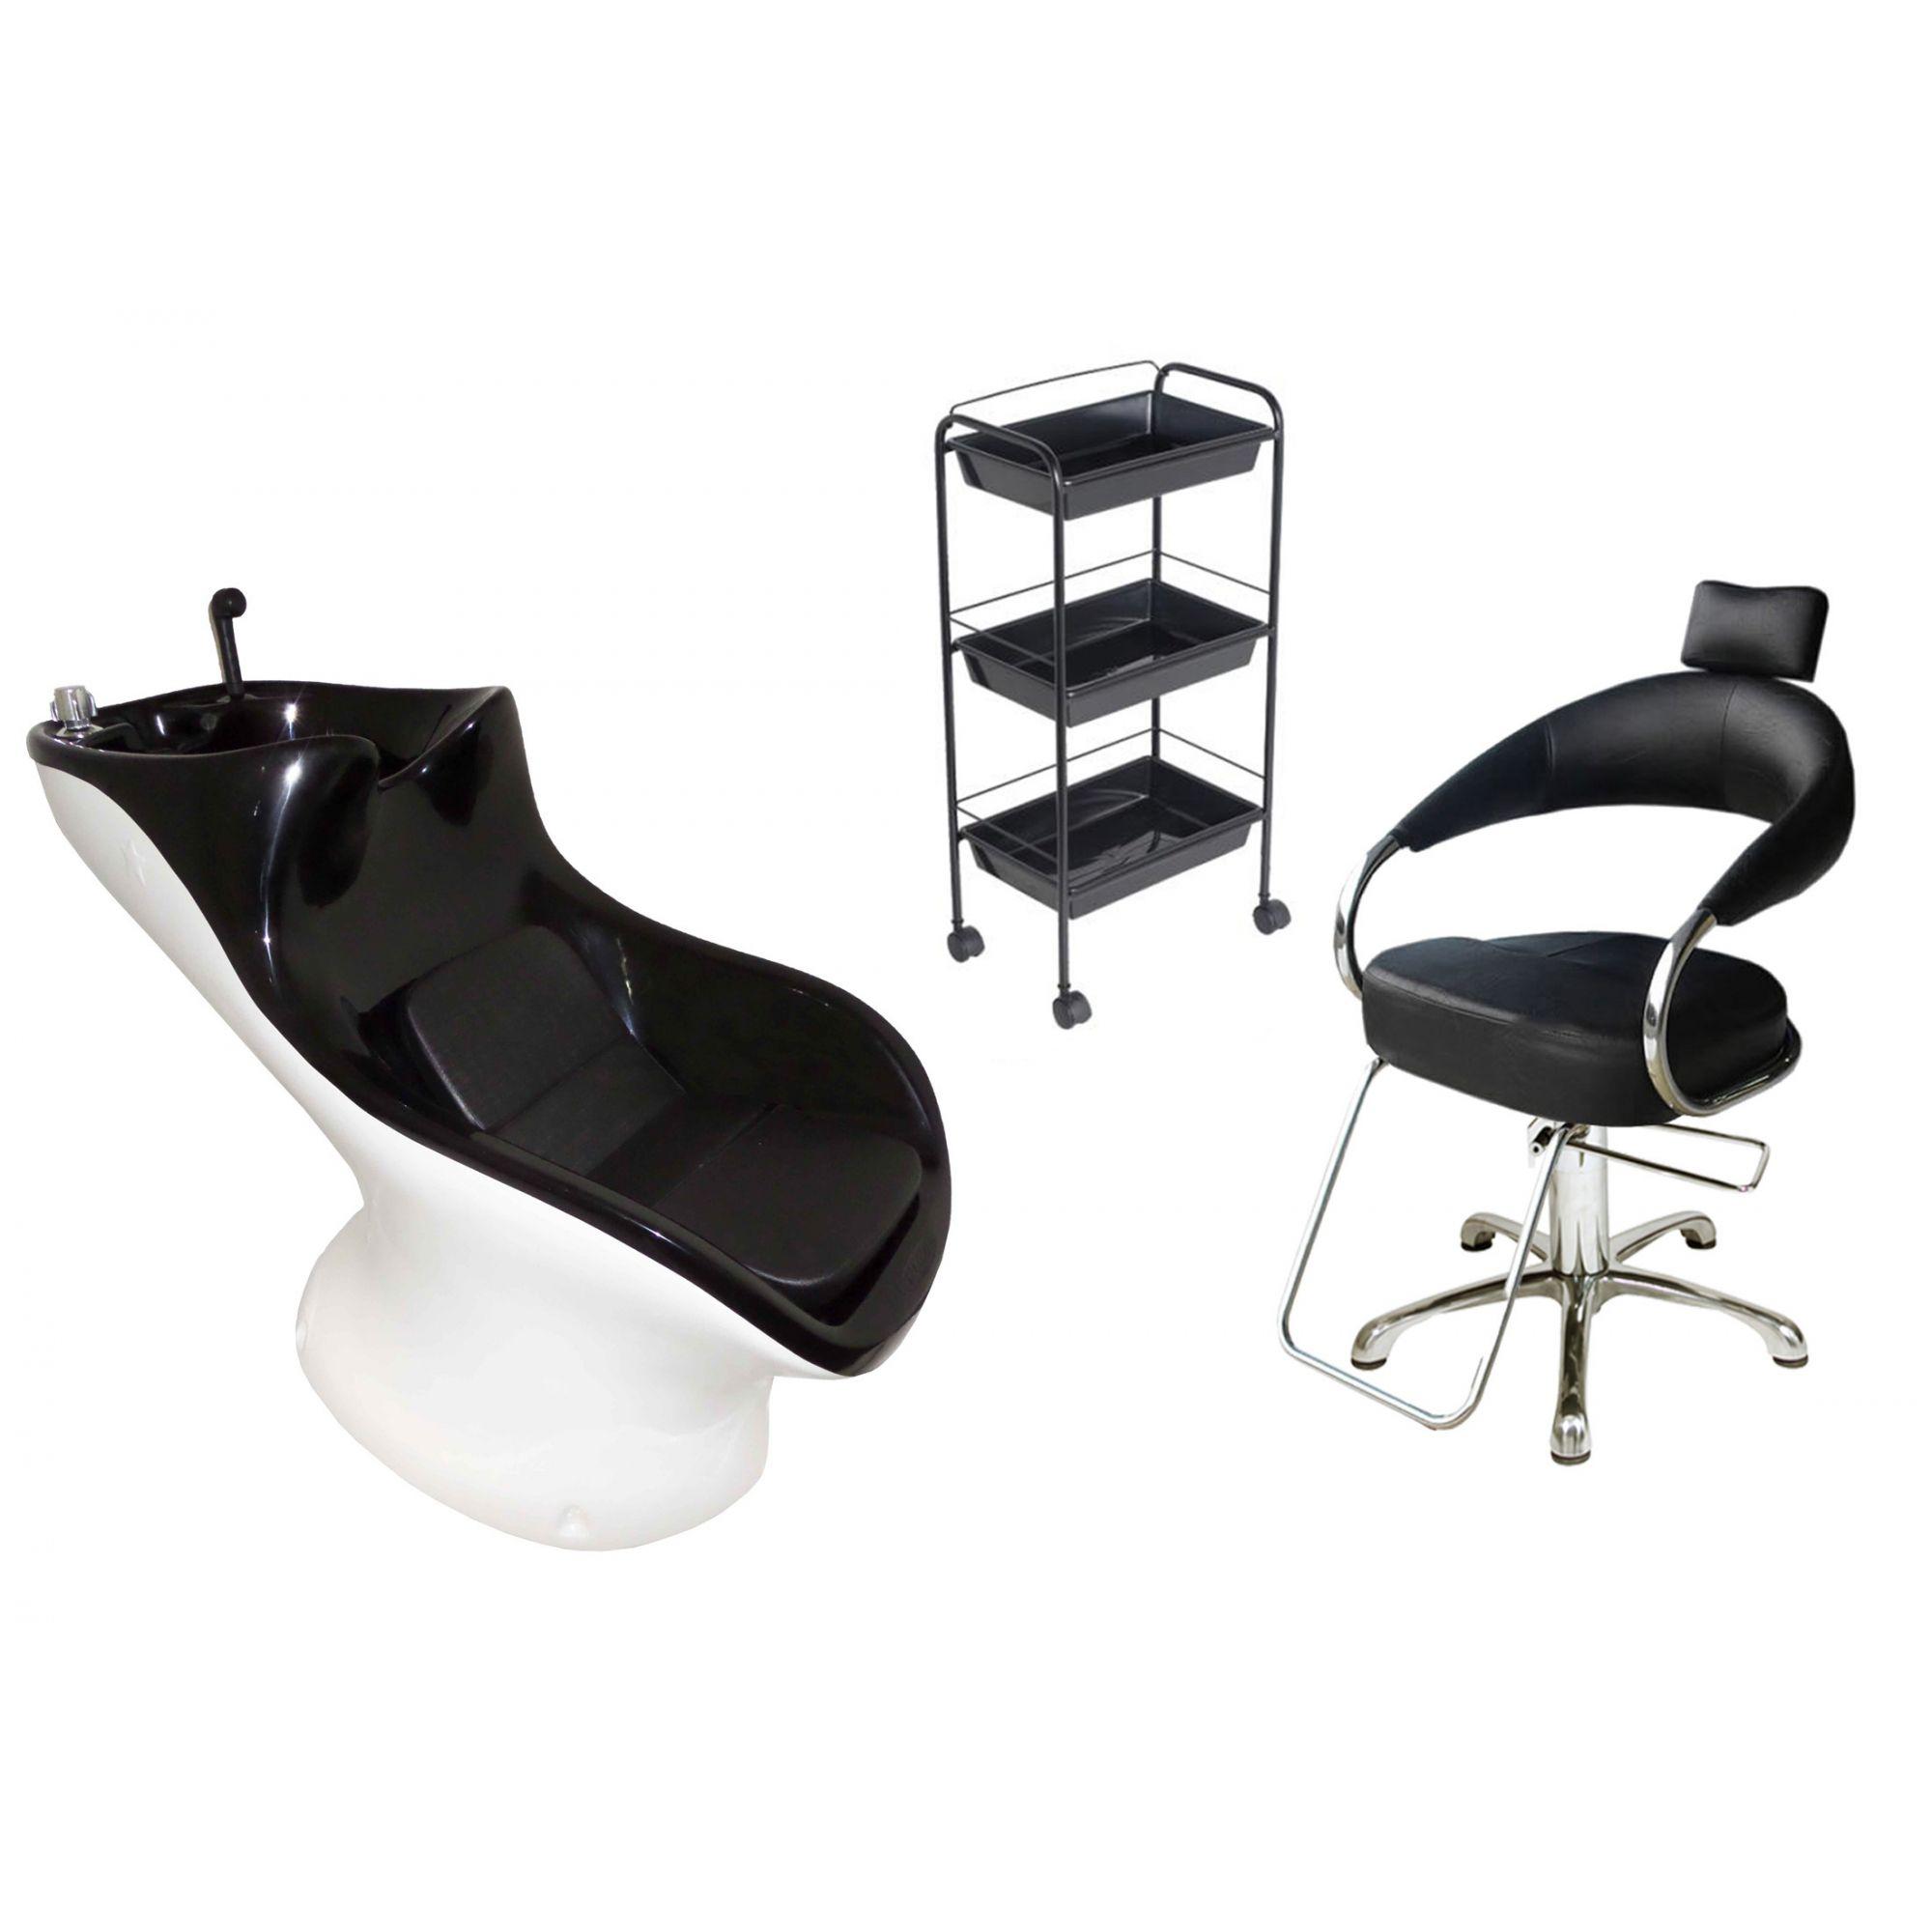 Lavatório Star Italiano + Cadeira Hidráulica Futurama + CG3